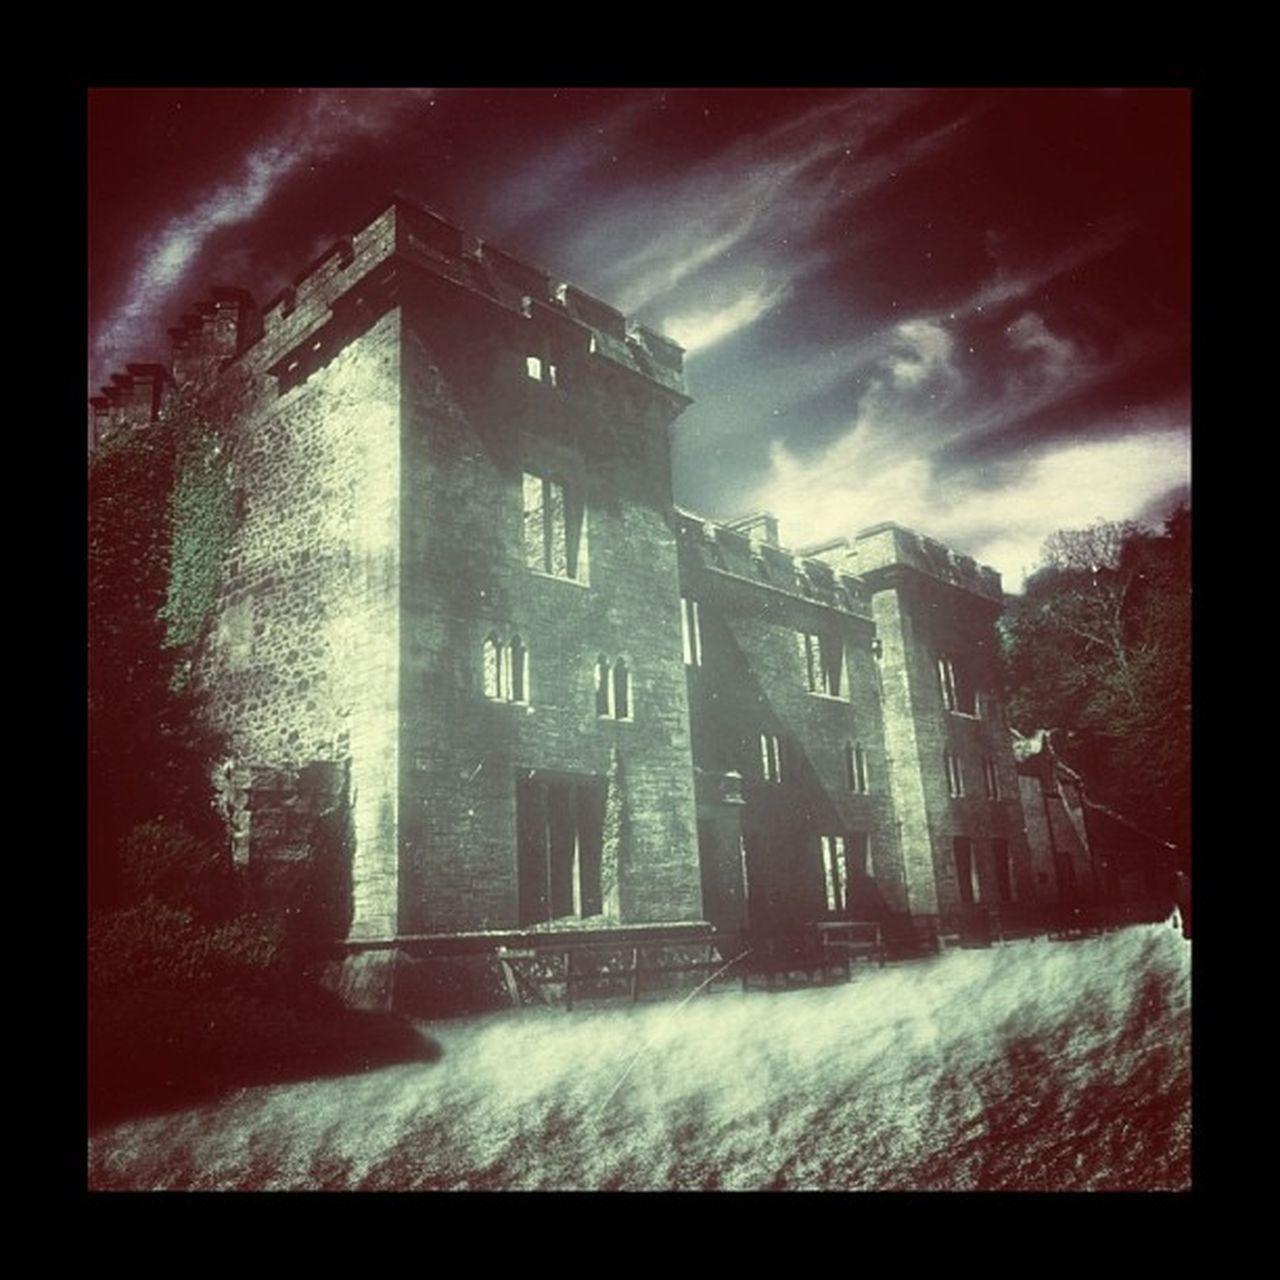 #masters_of_darkness #igdungeon #pf_arts #creepy Creepy Grunge Dark Igdungeon Rsa_ladies Rsa_dark Masters_of_darkness United_by_darkness Pf_arts Thehorrorgallery